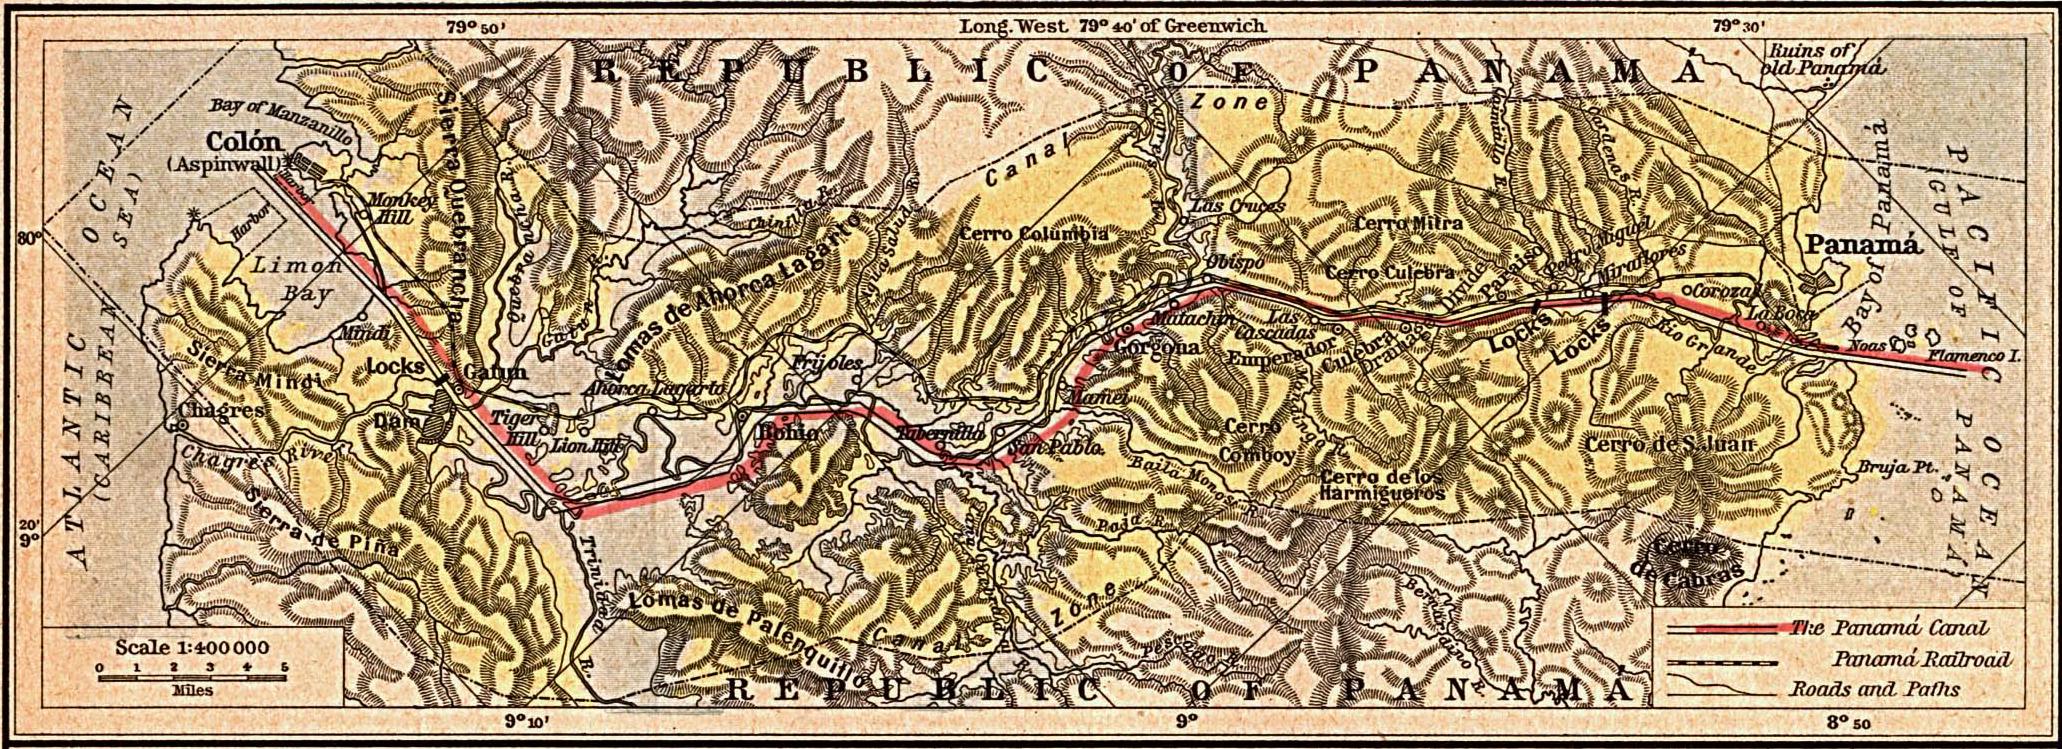 File:Panama-canal-shepherd-map.png - Wikimedia Commons